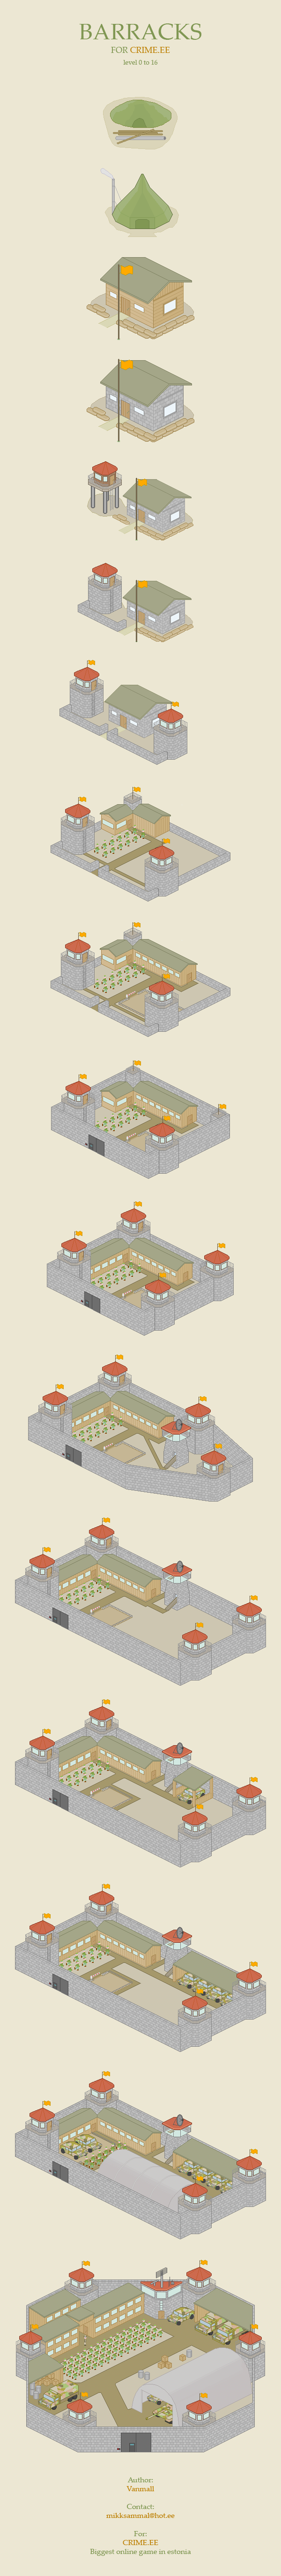 Barracks for crime.ee by vanmall.deviantart.com on @deviantART